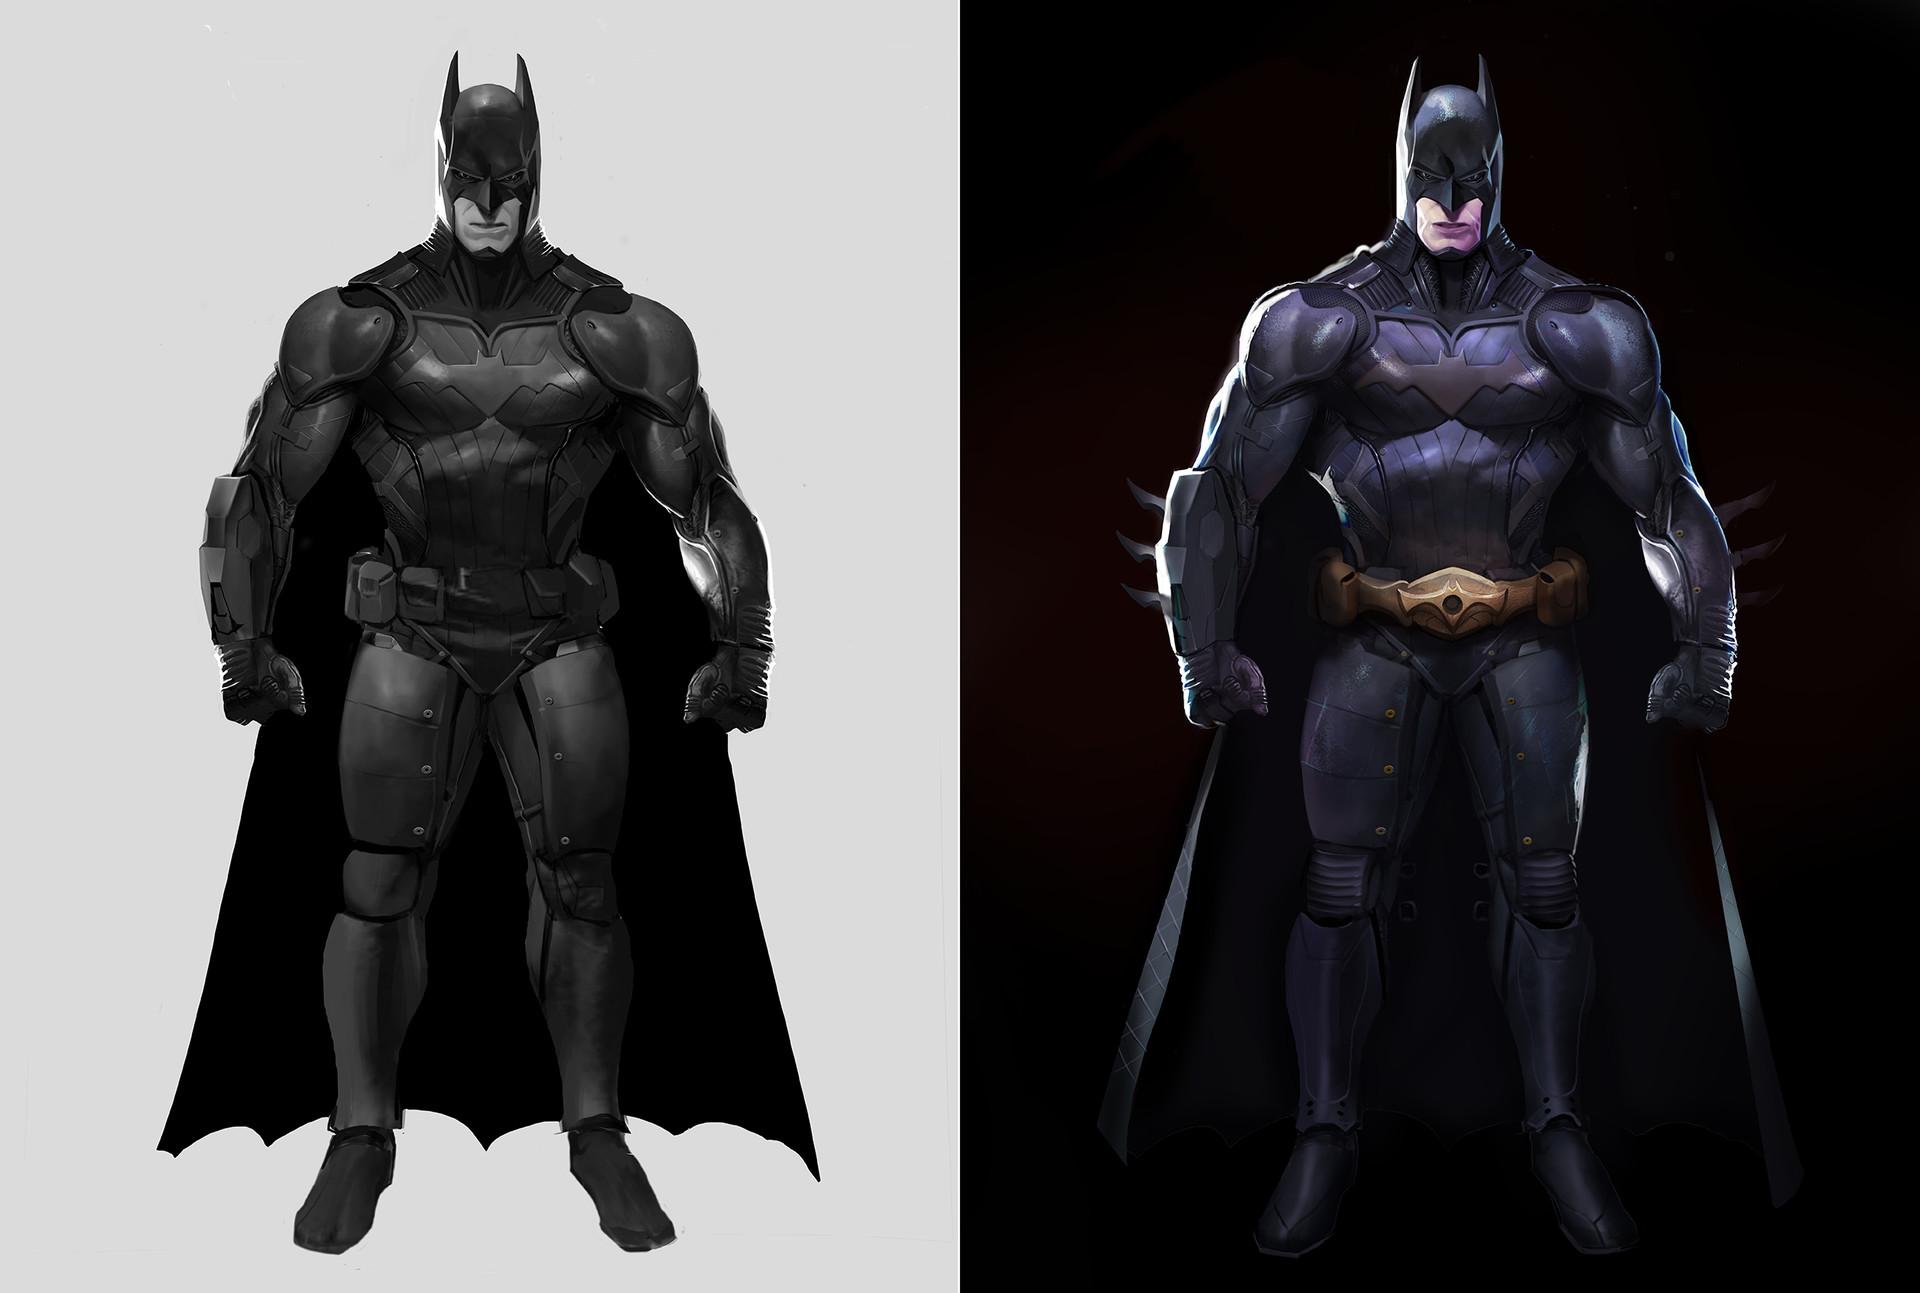 Marco nelor bats small & marco nelor - Batman costume and explorations